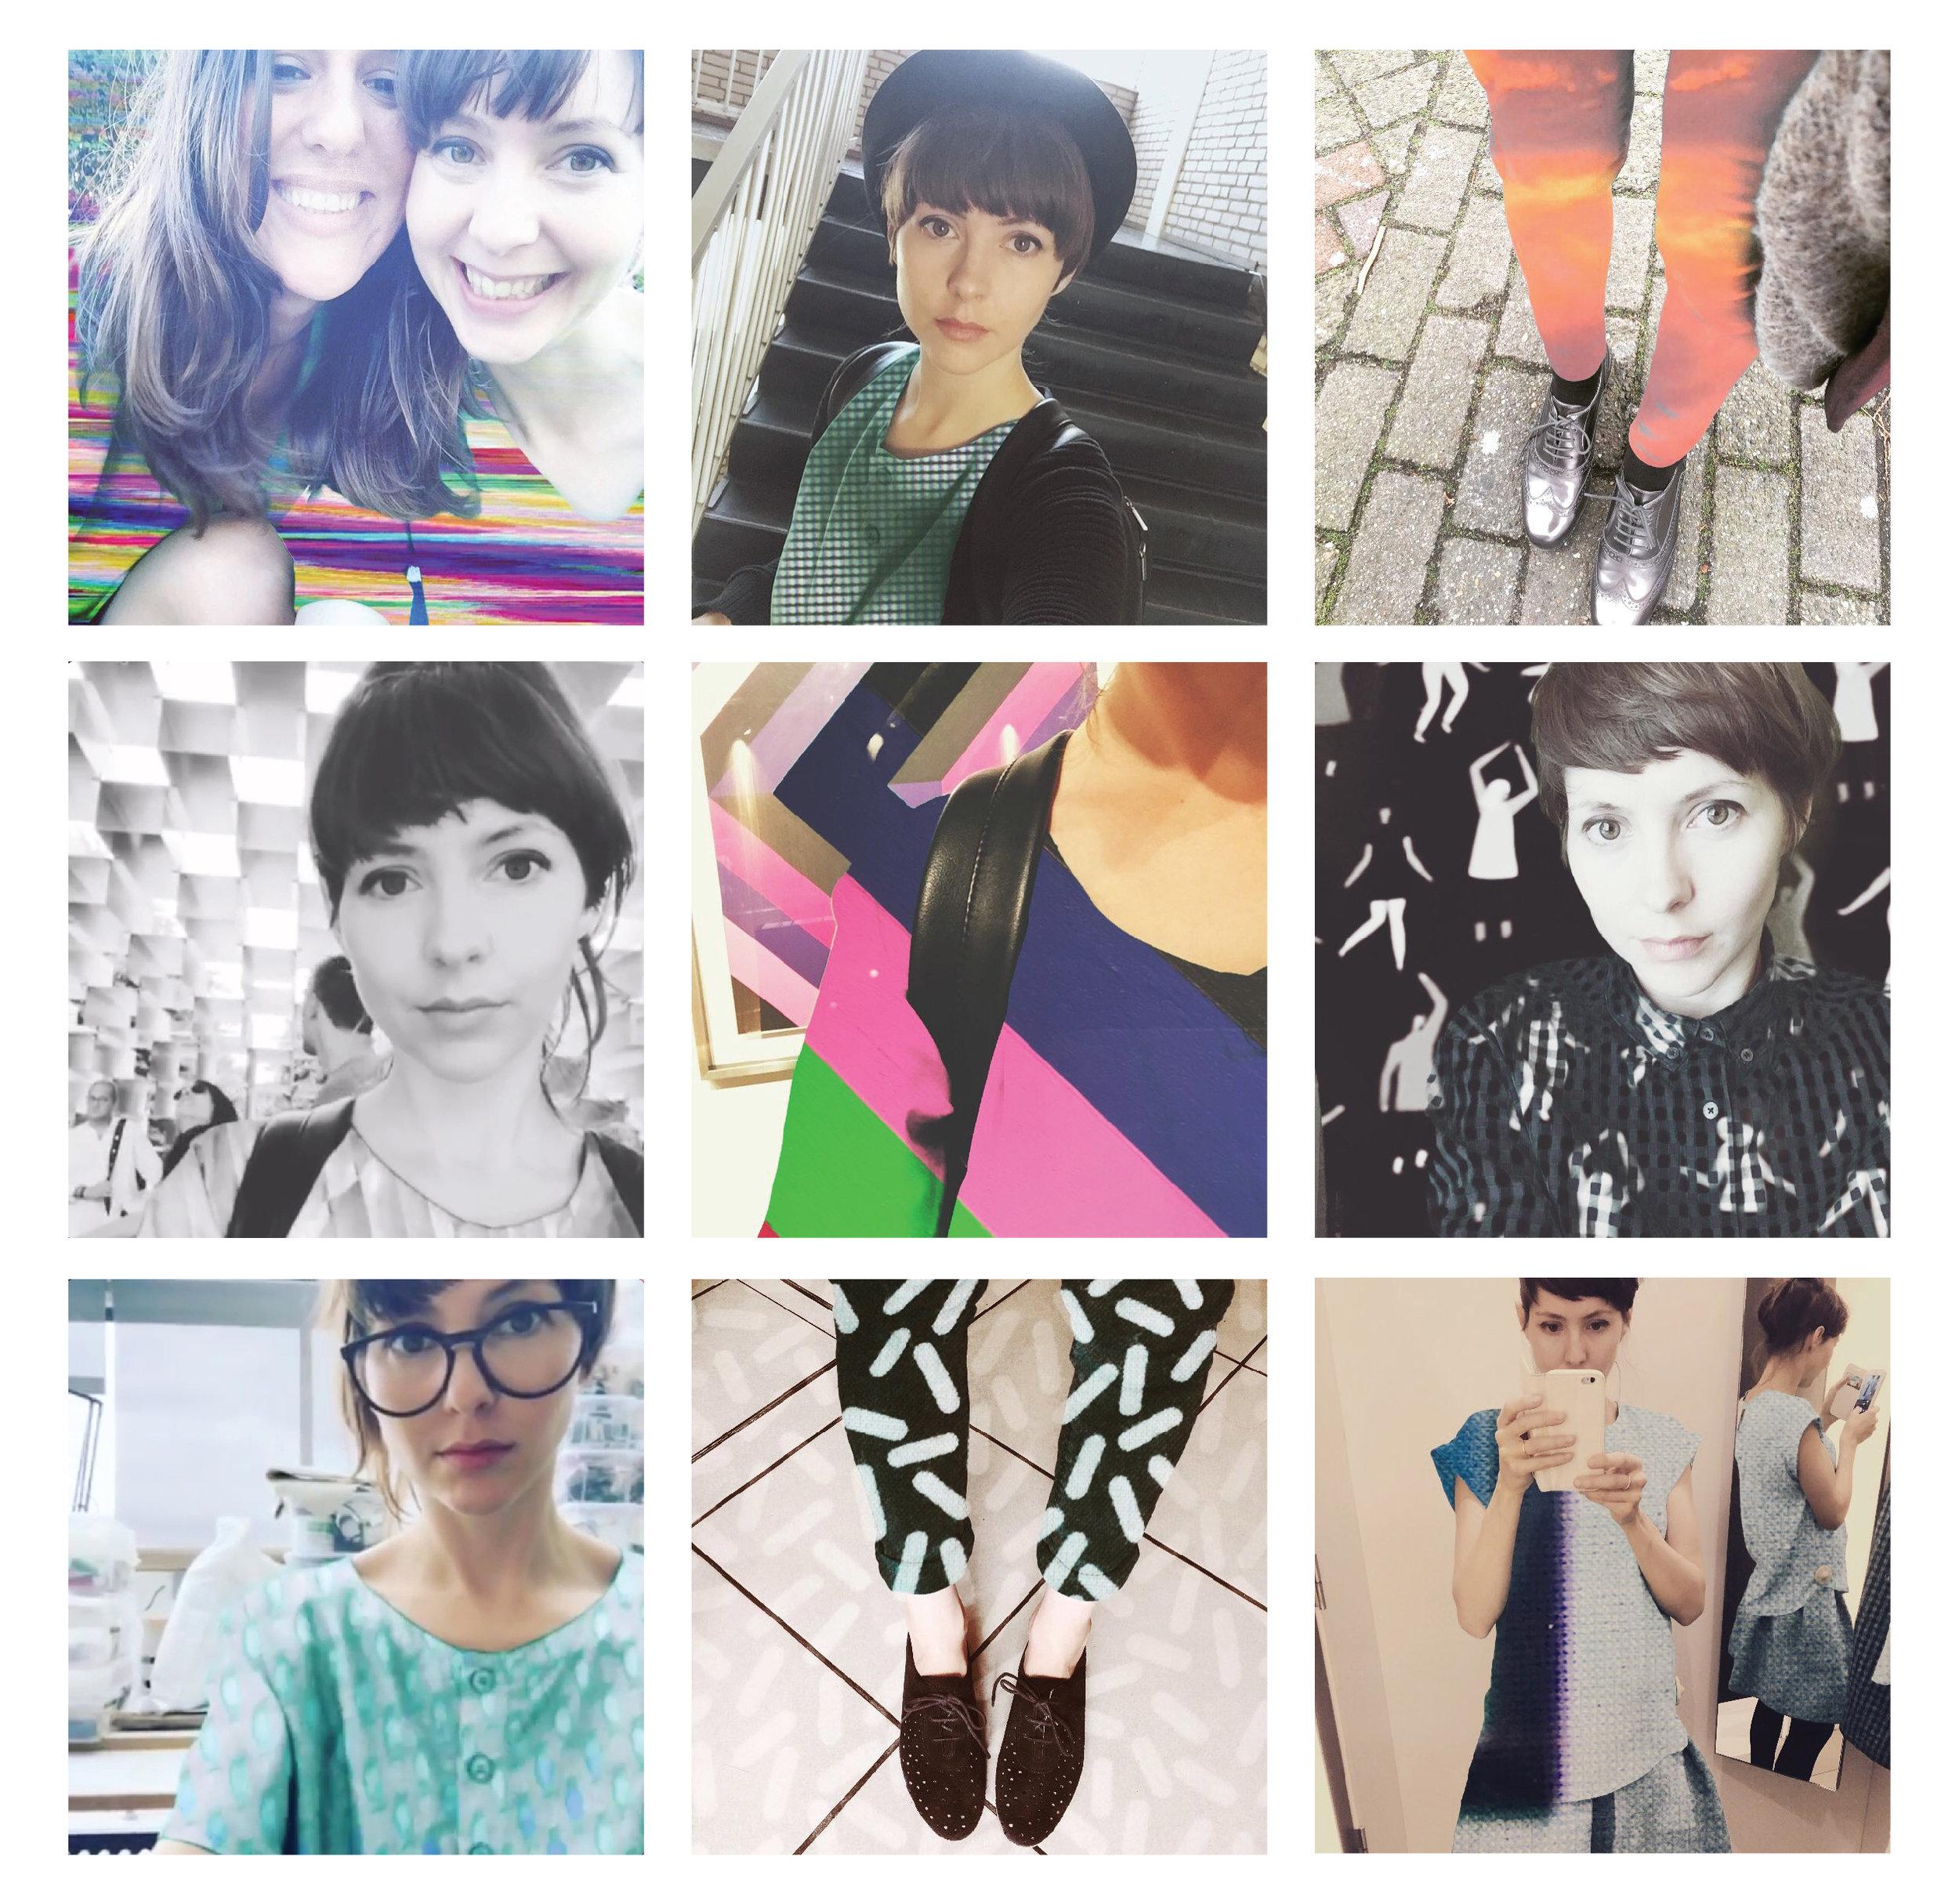 Instagram_angellamackey_2016.jpg